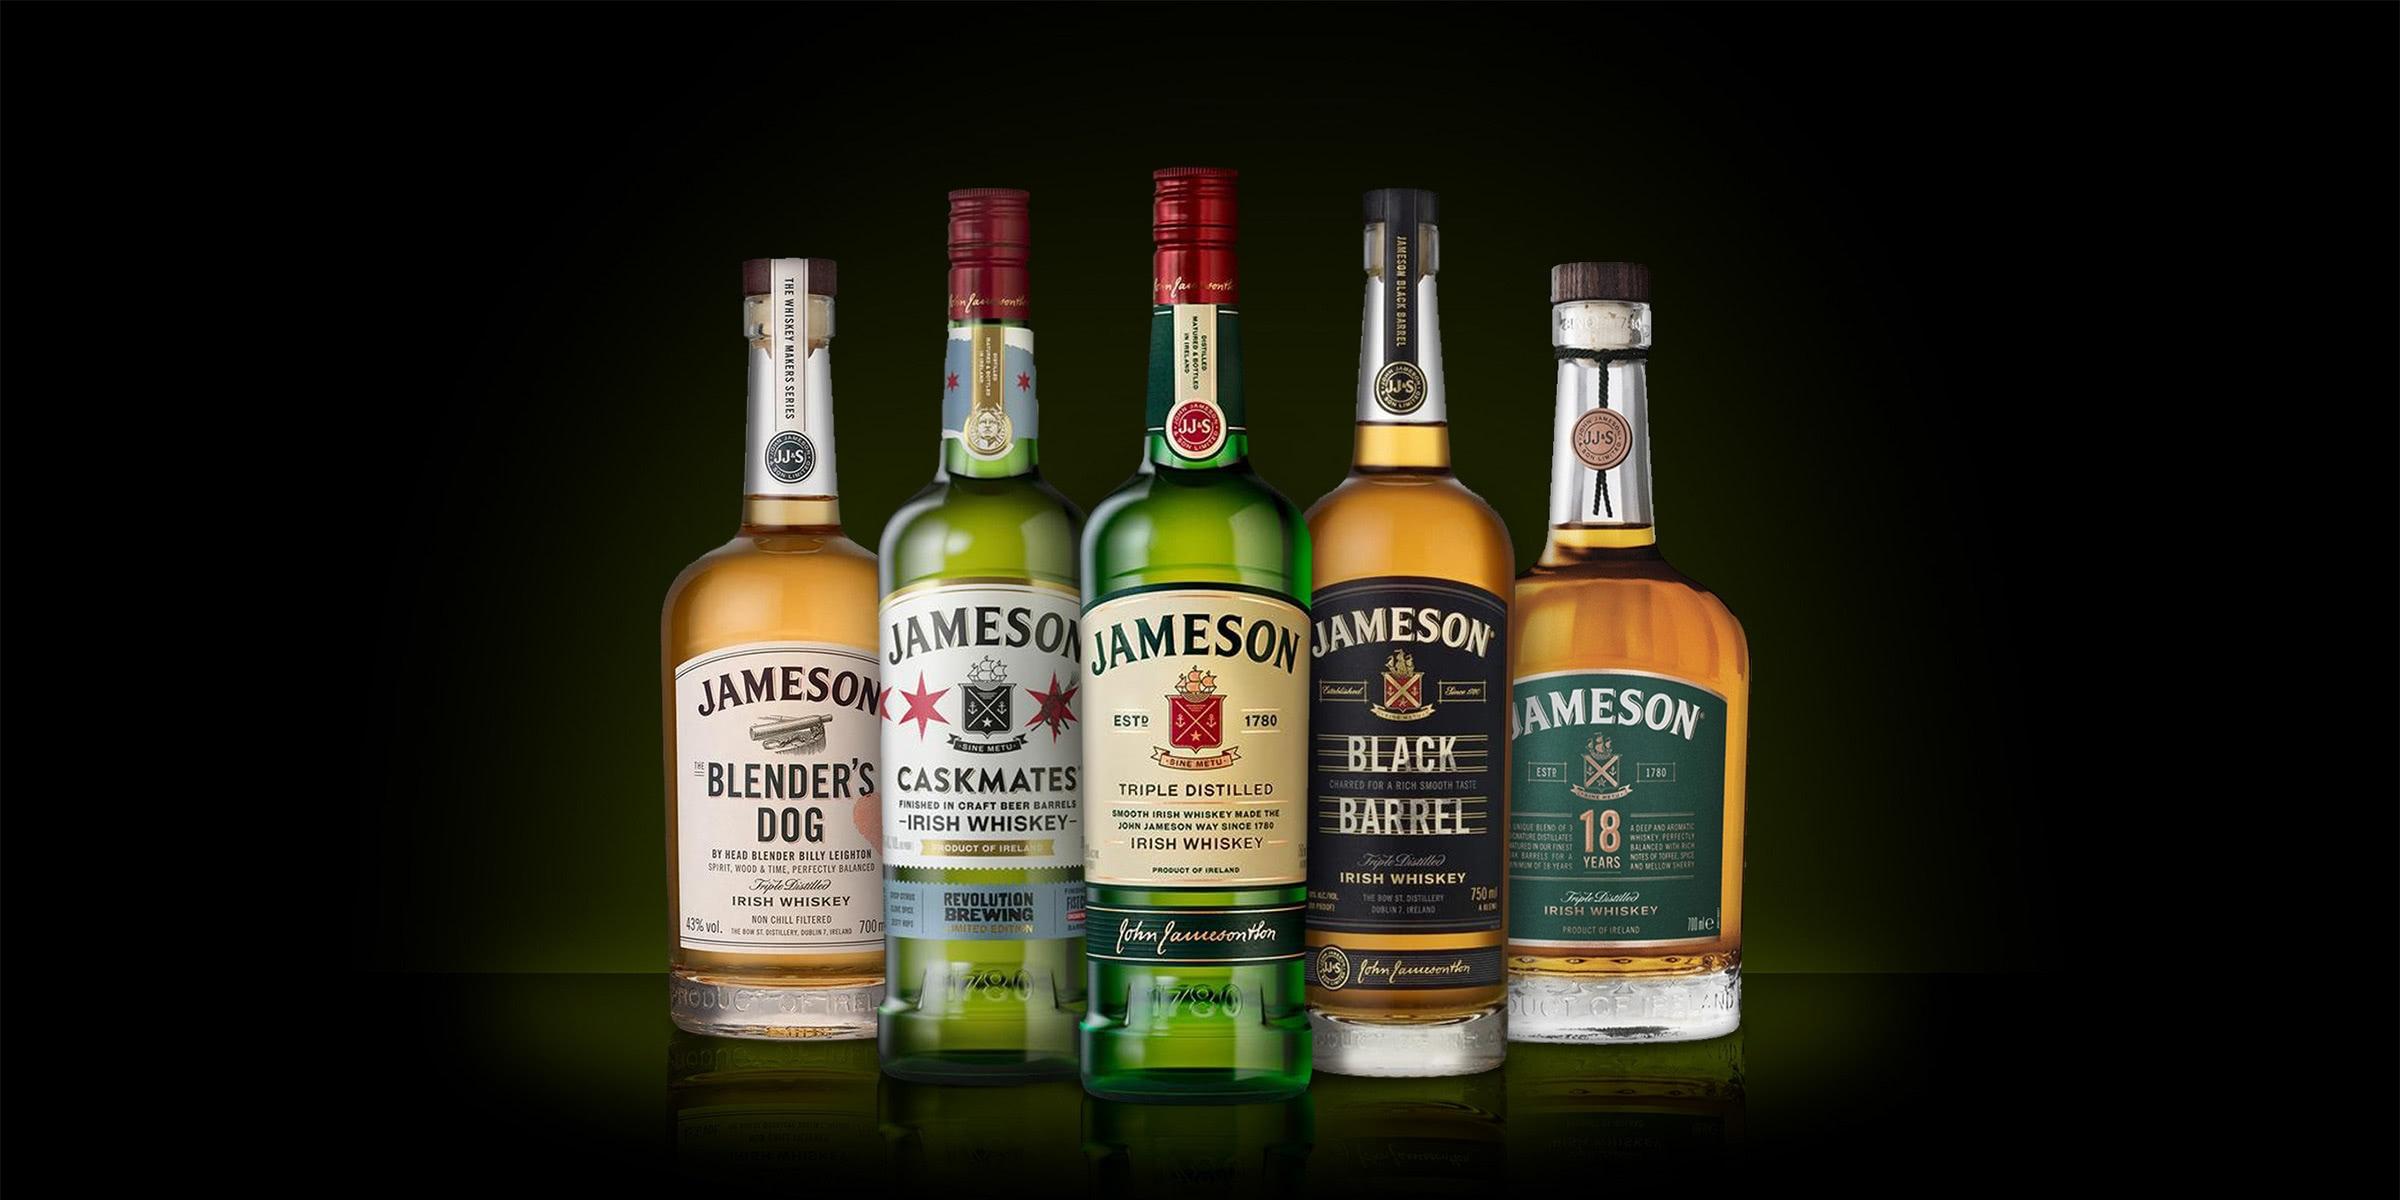 jameson whiskey - Luxe Digital